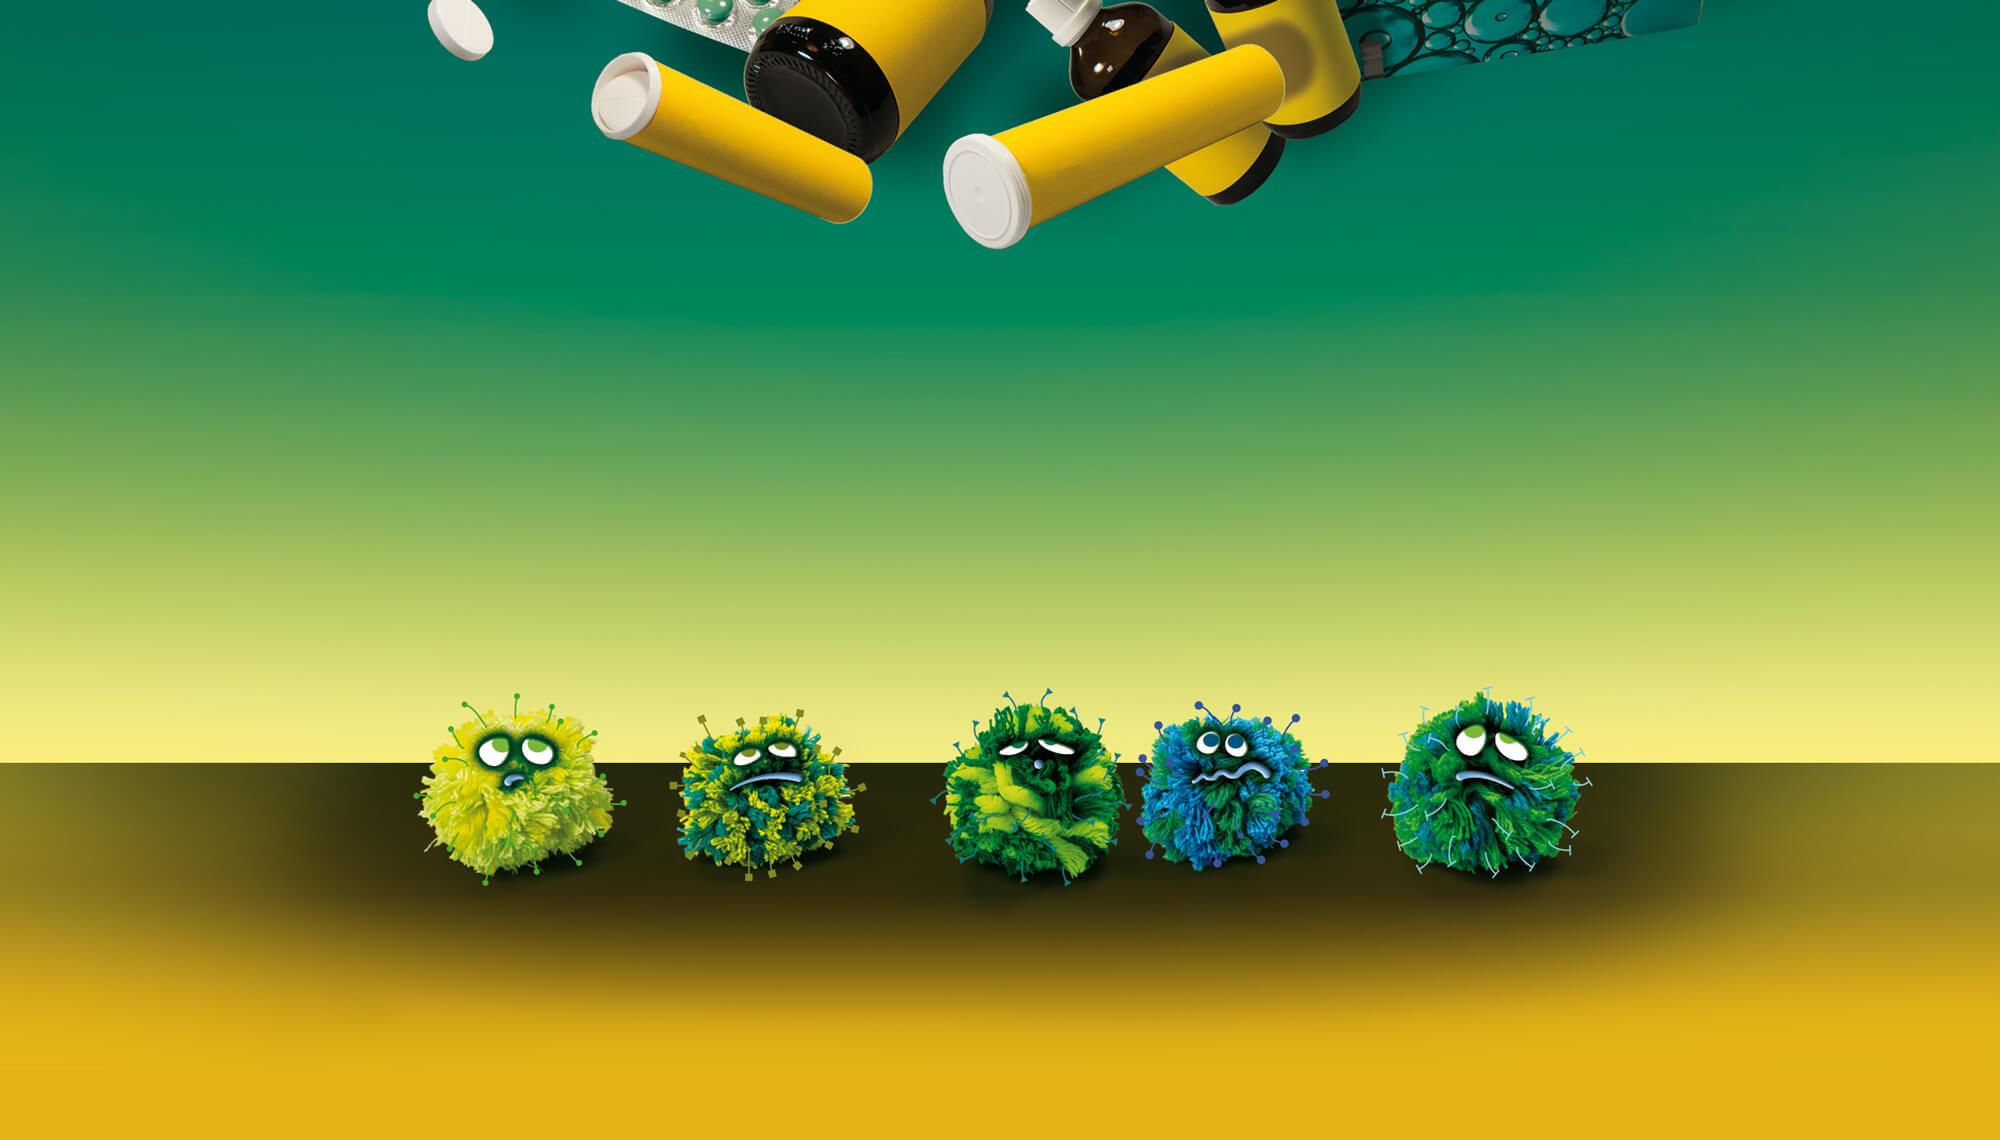 bild der wissenschaft / Erkältung / Viren